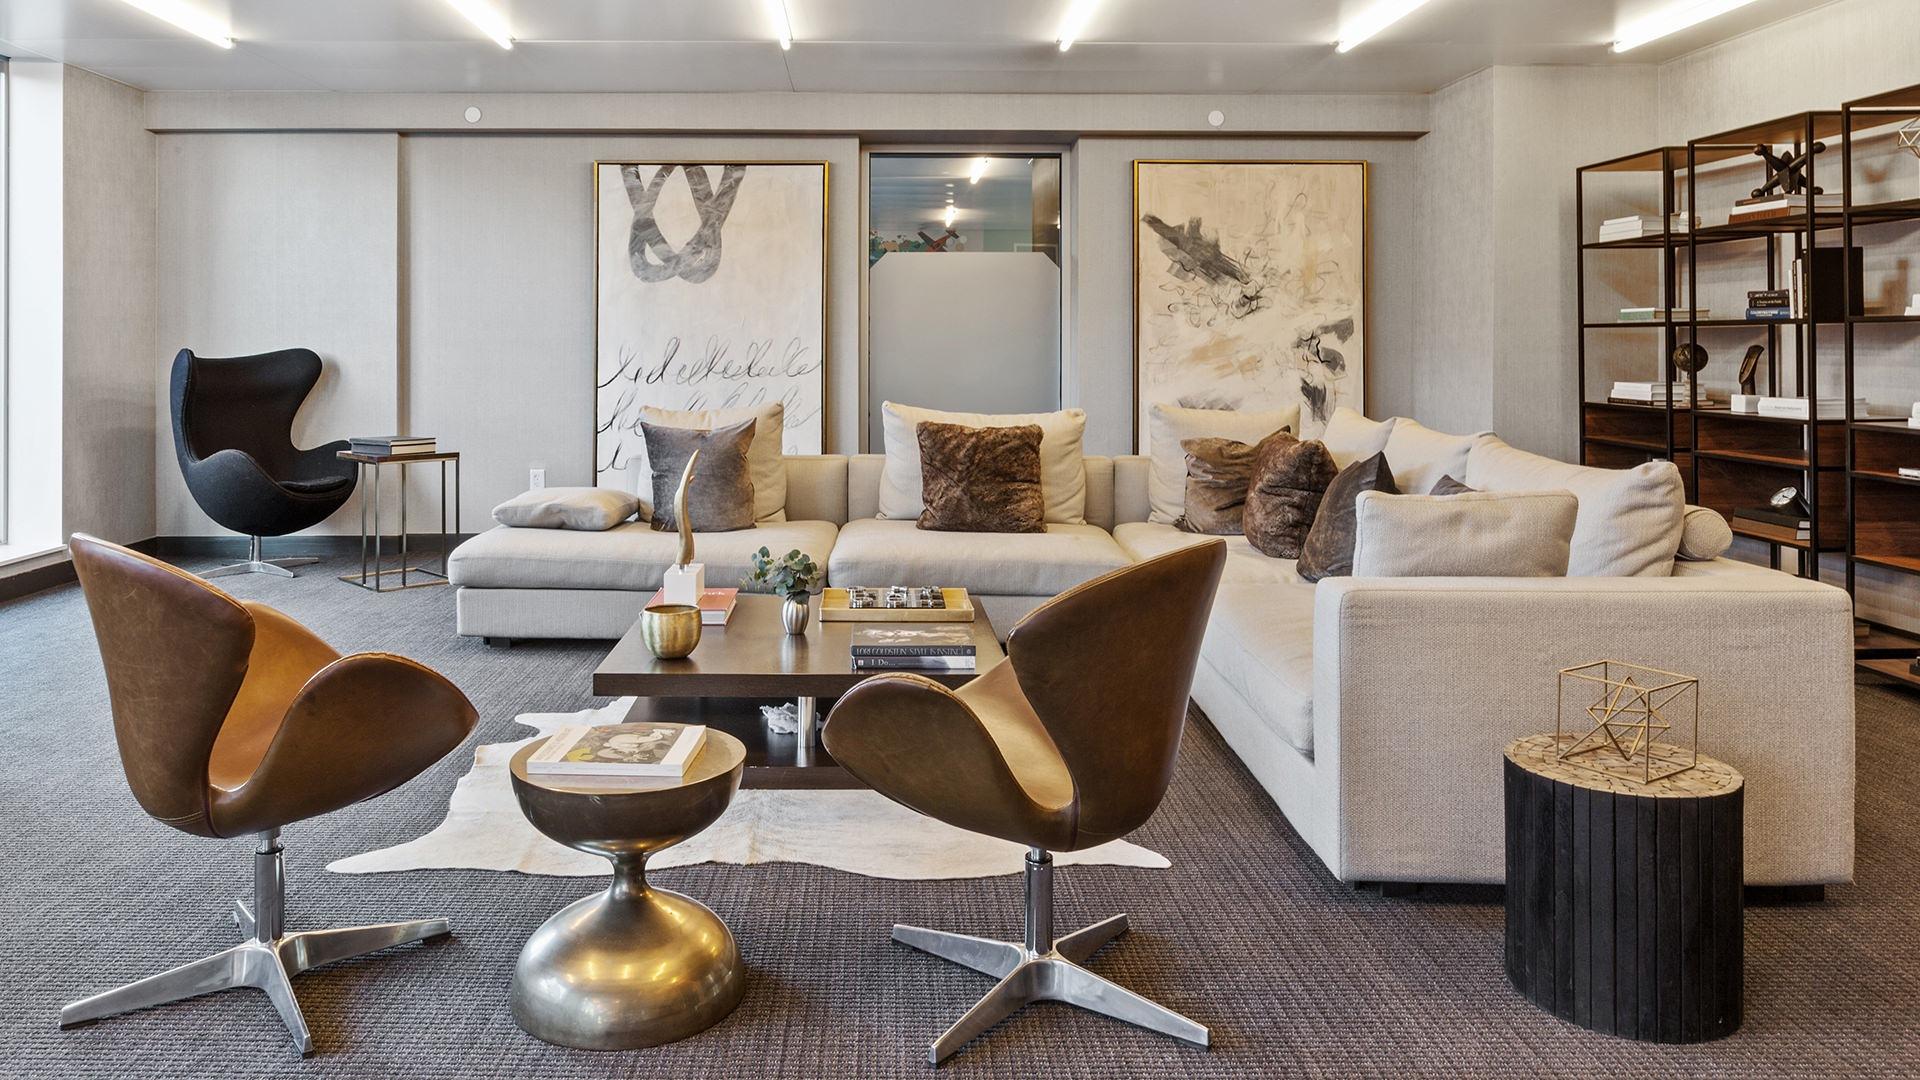 Craigslist Apartment Guide | Appartment